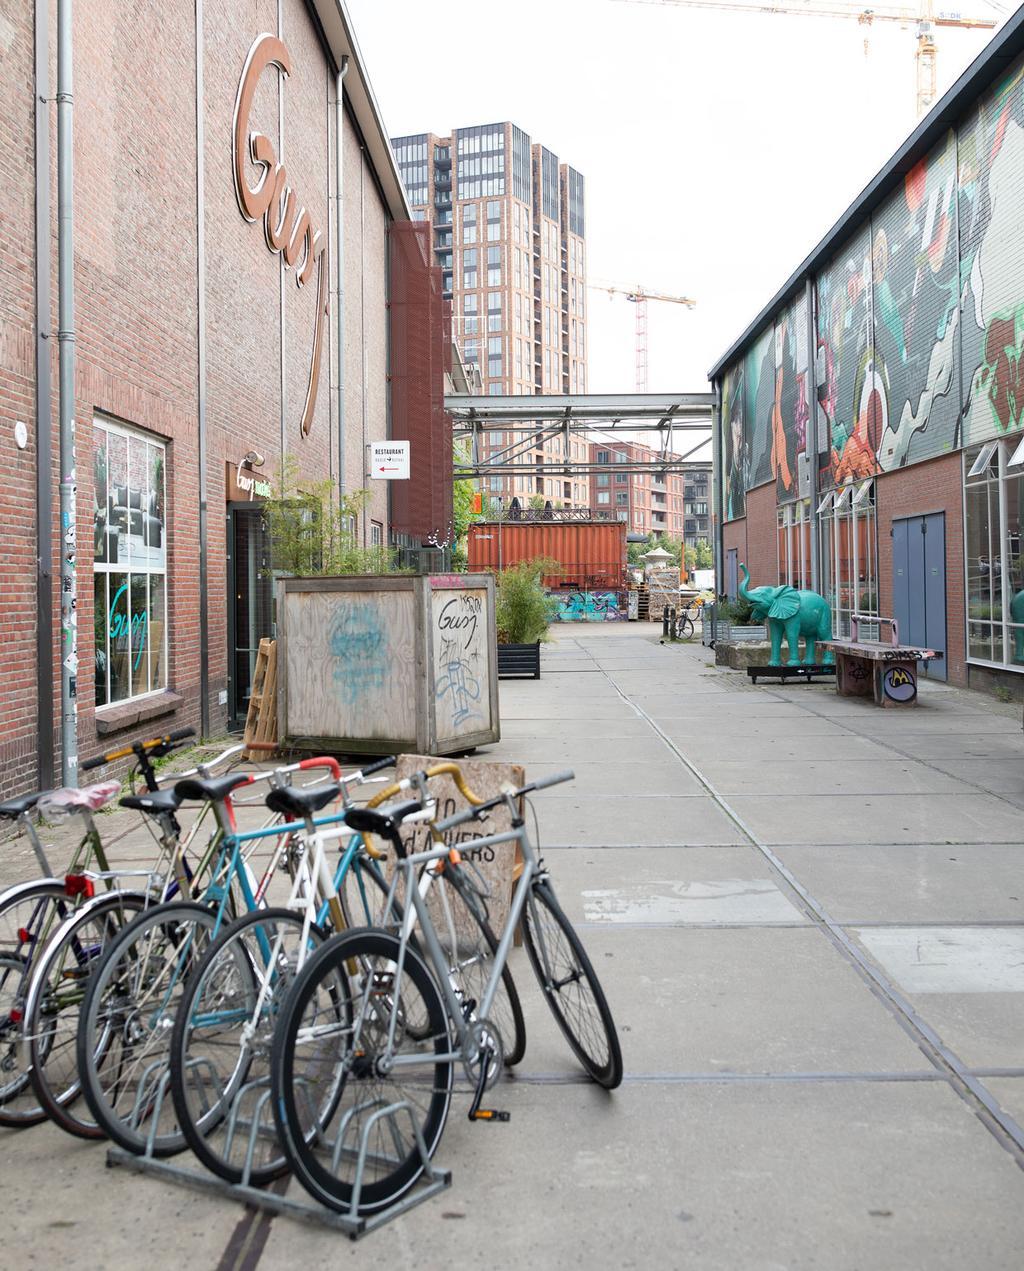 vtwonen 10-2019 | citytrip Eindhoven Strijp-S fietsen industrieel